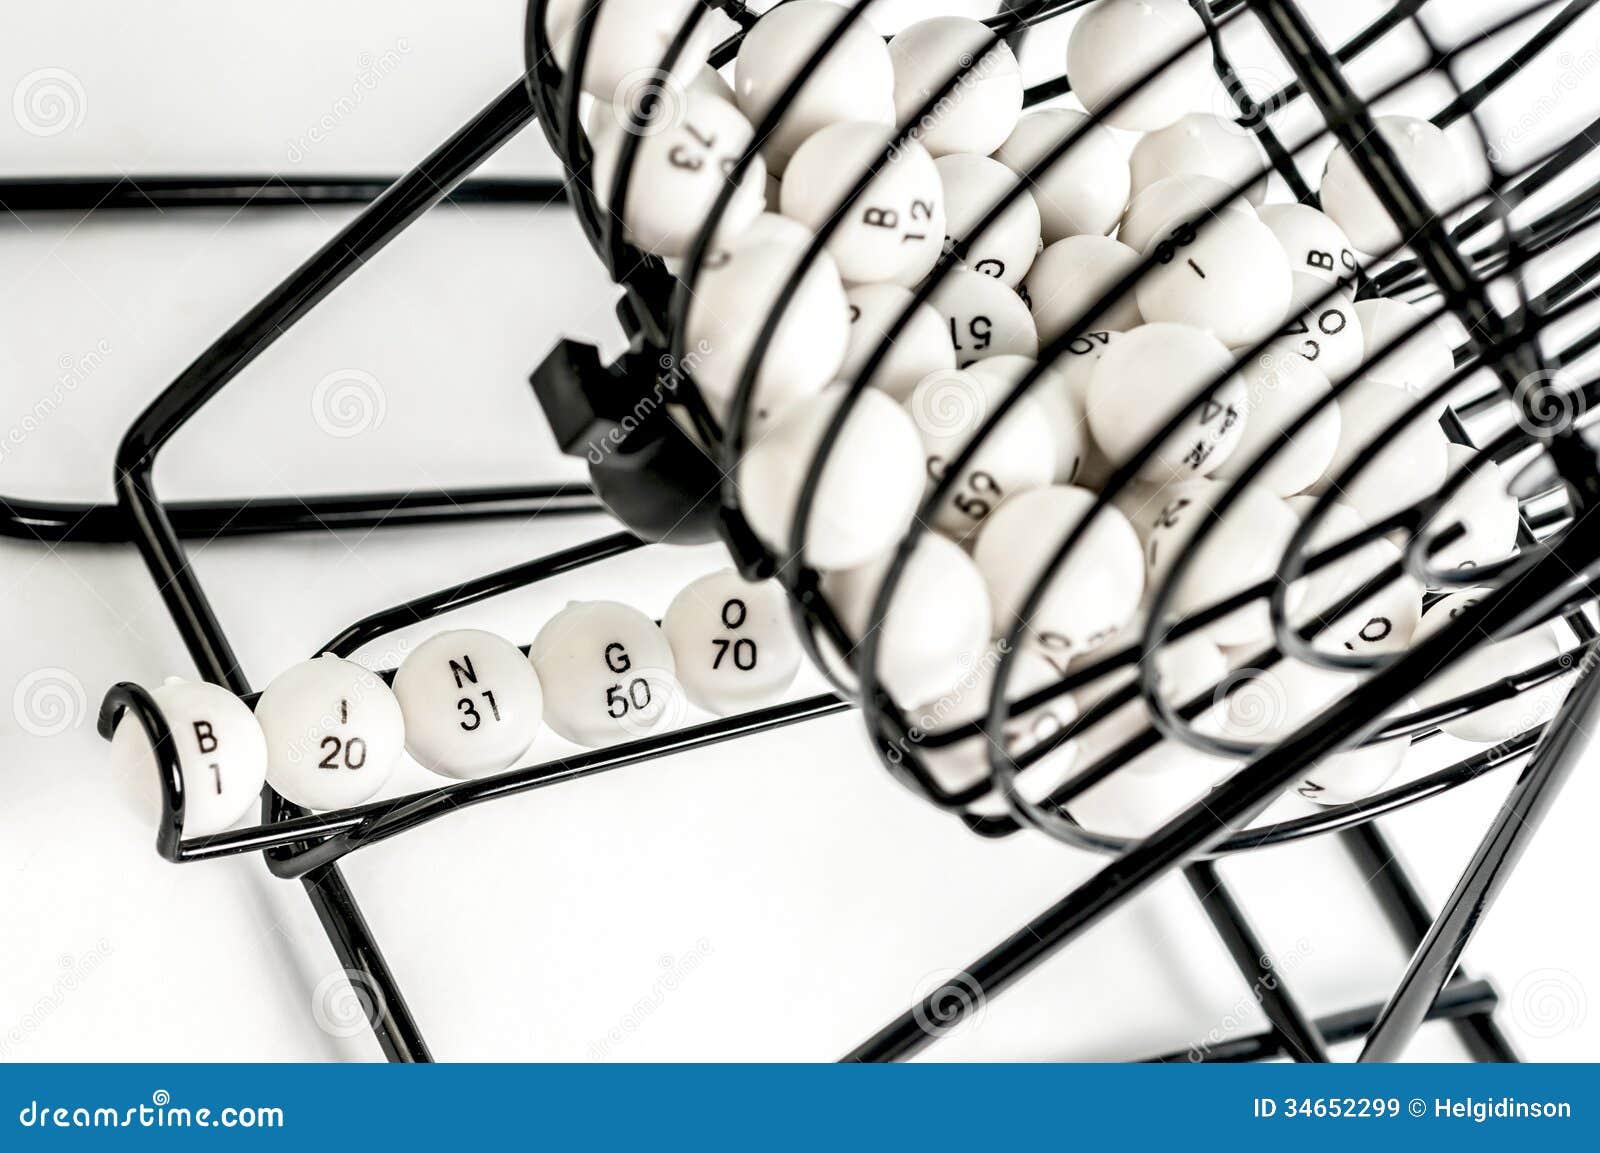 Knitting Business Idea